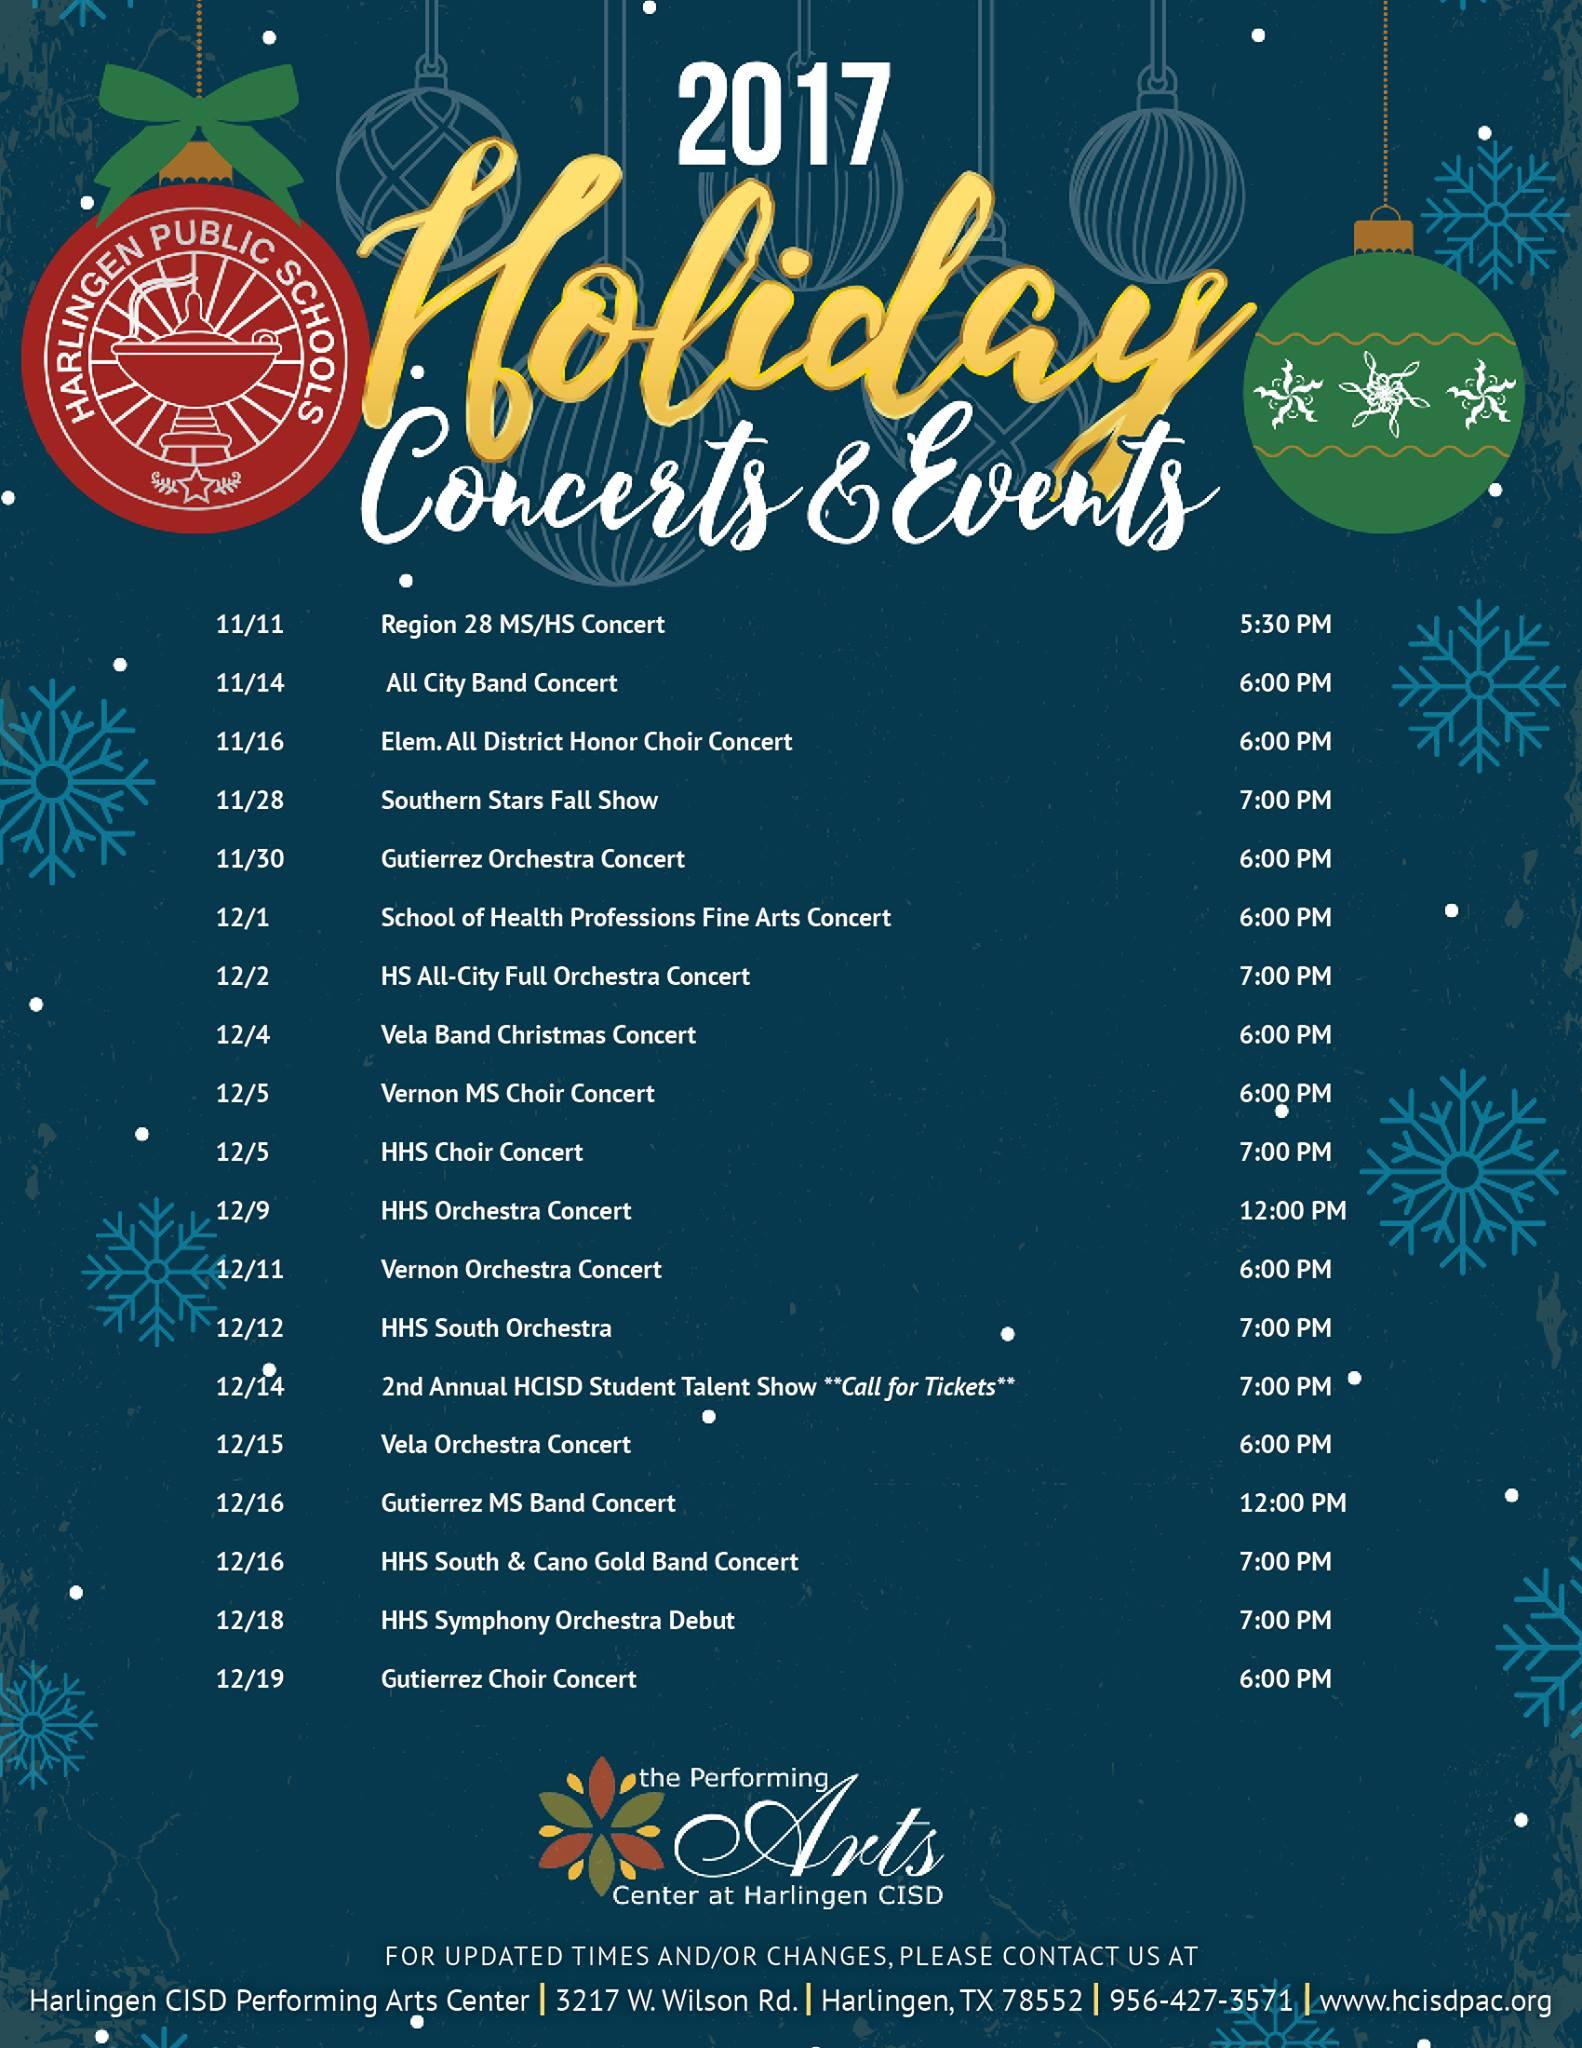 2017 Holiday Concert Schedule